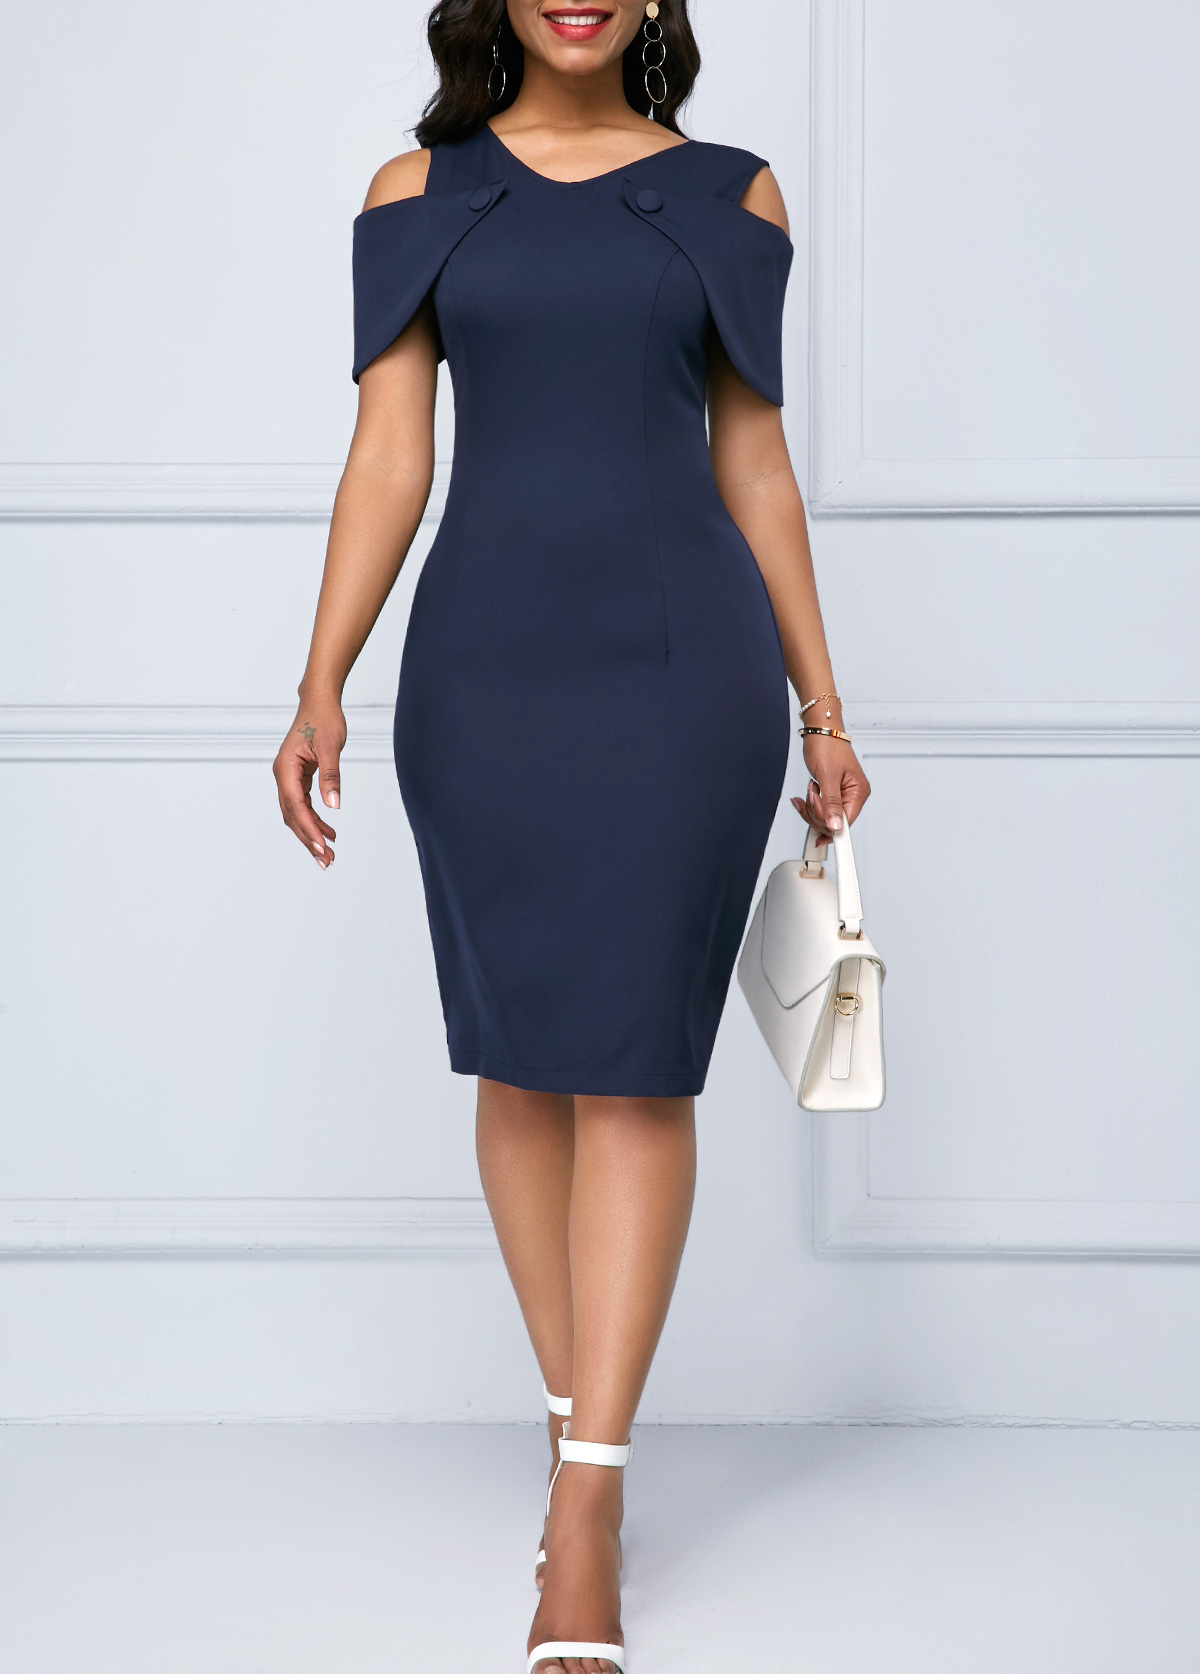 Cold Shoulder Lace Patchwork Navy Blue Sheath Dress